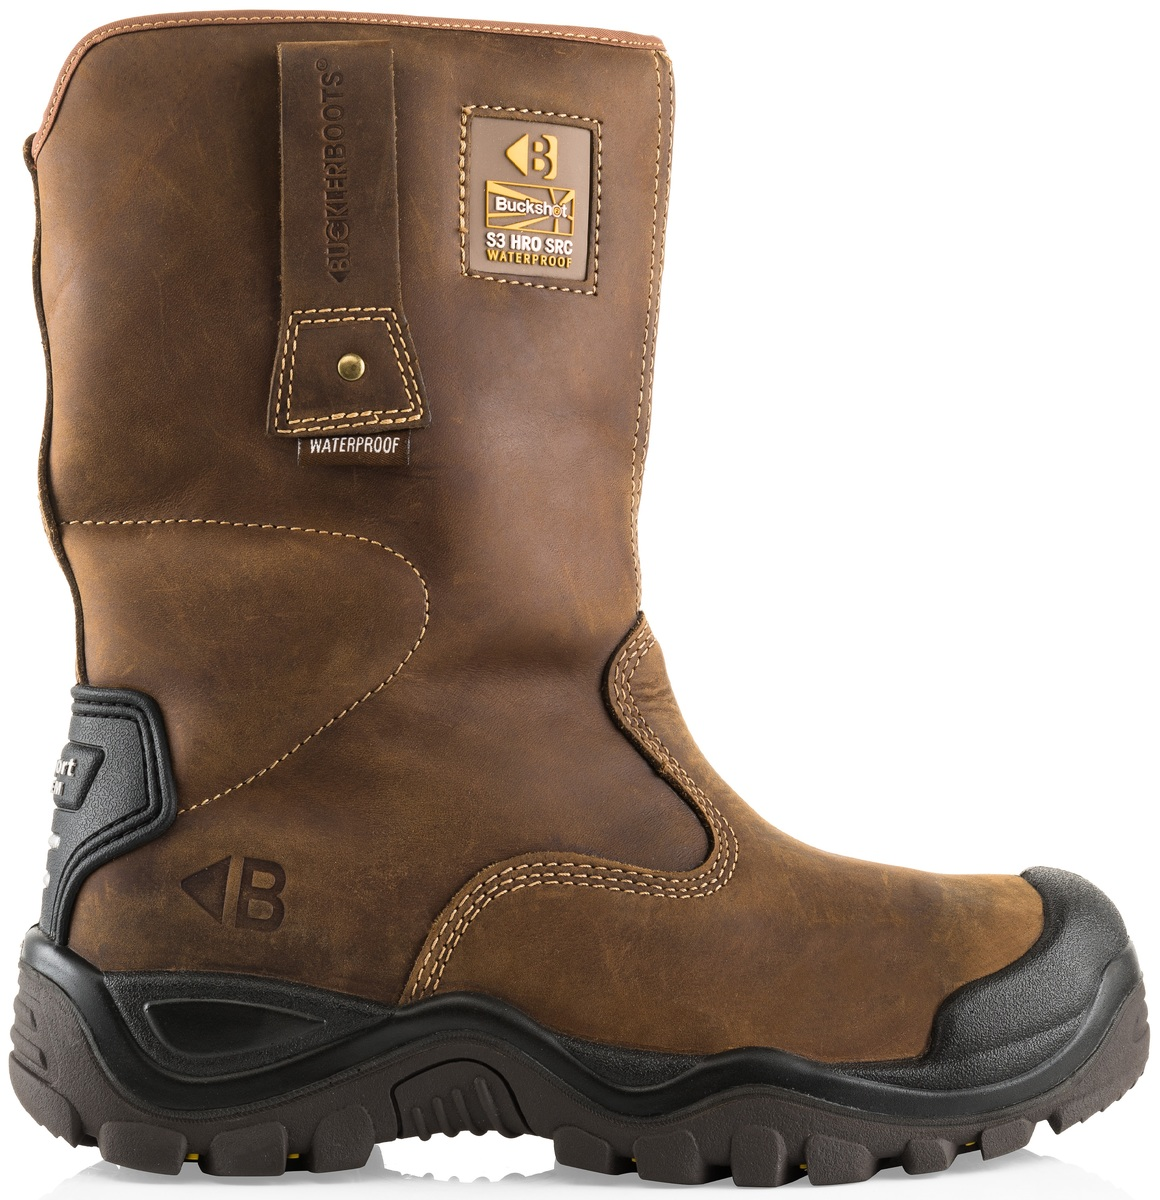 8abfdf2b39e Safety Rigger Boot - Buckshot - Rigger Boots - Buckler Boots